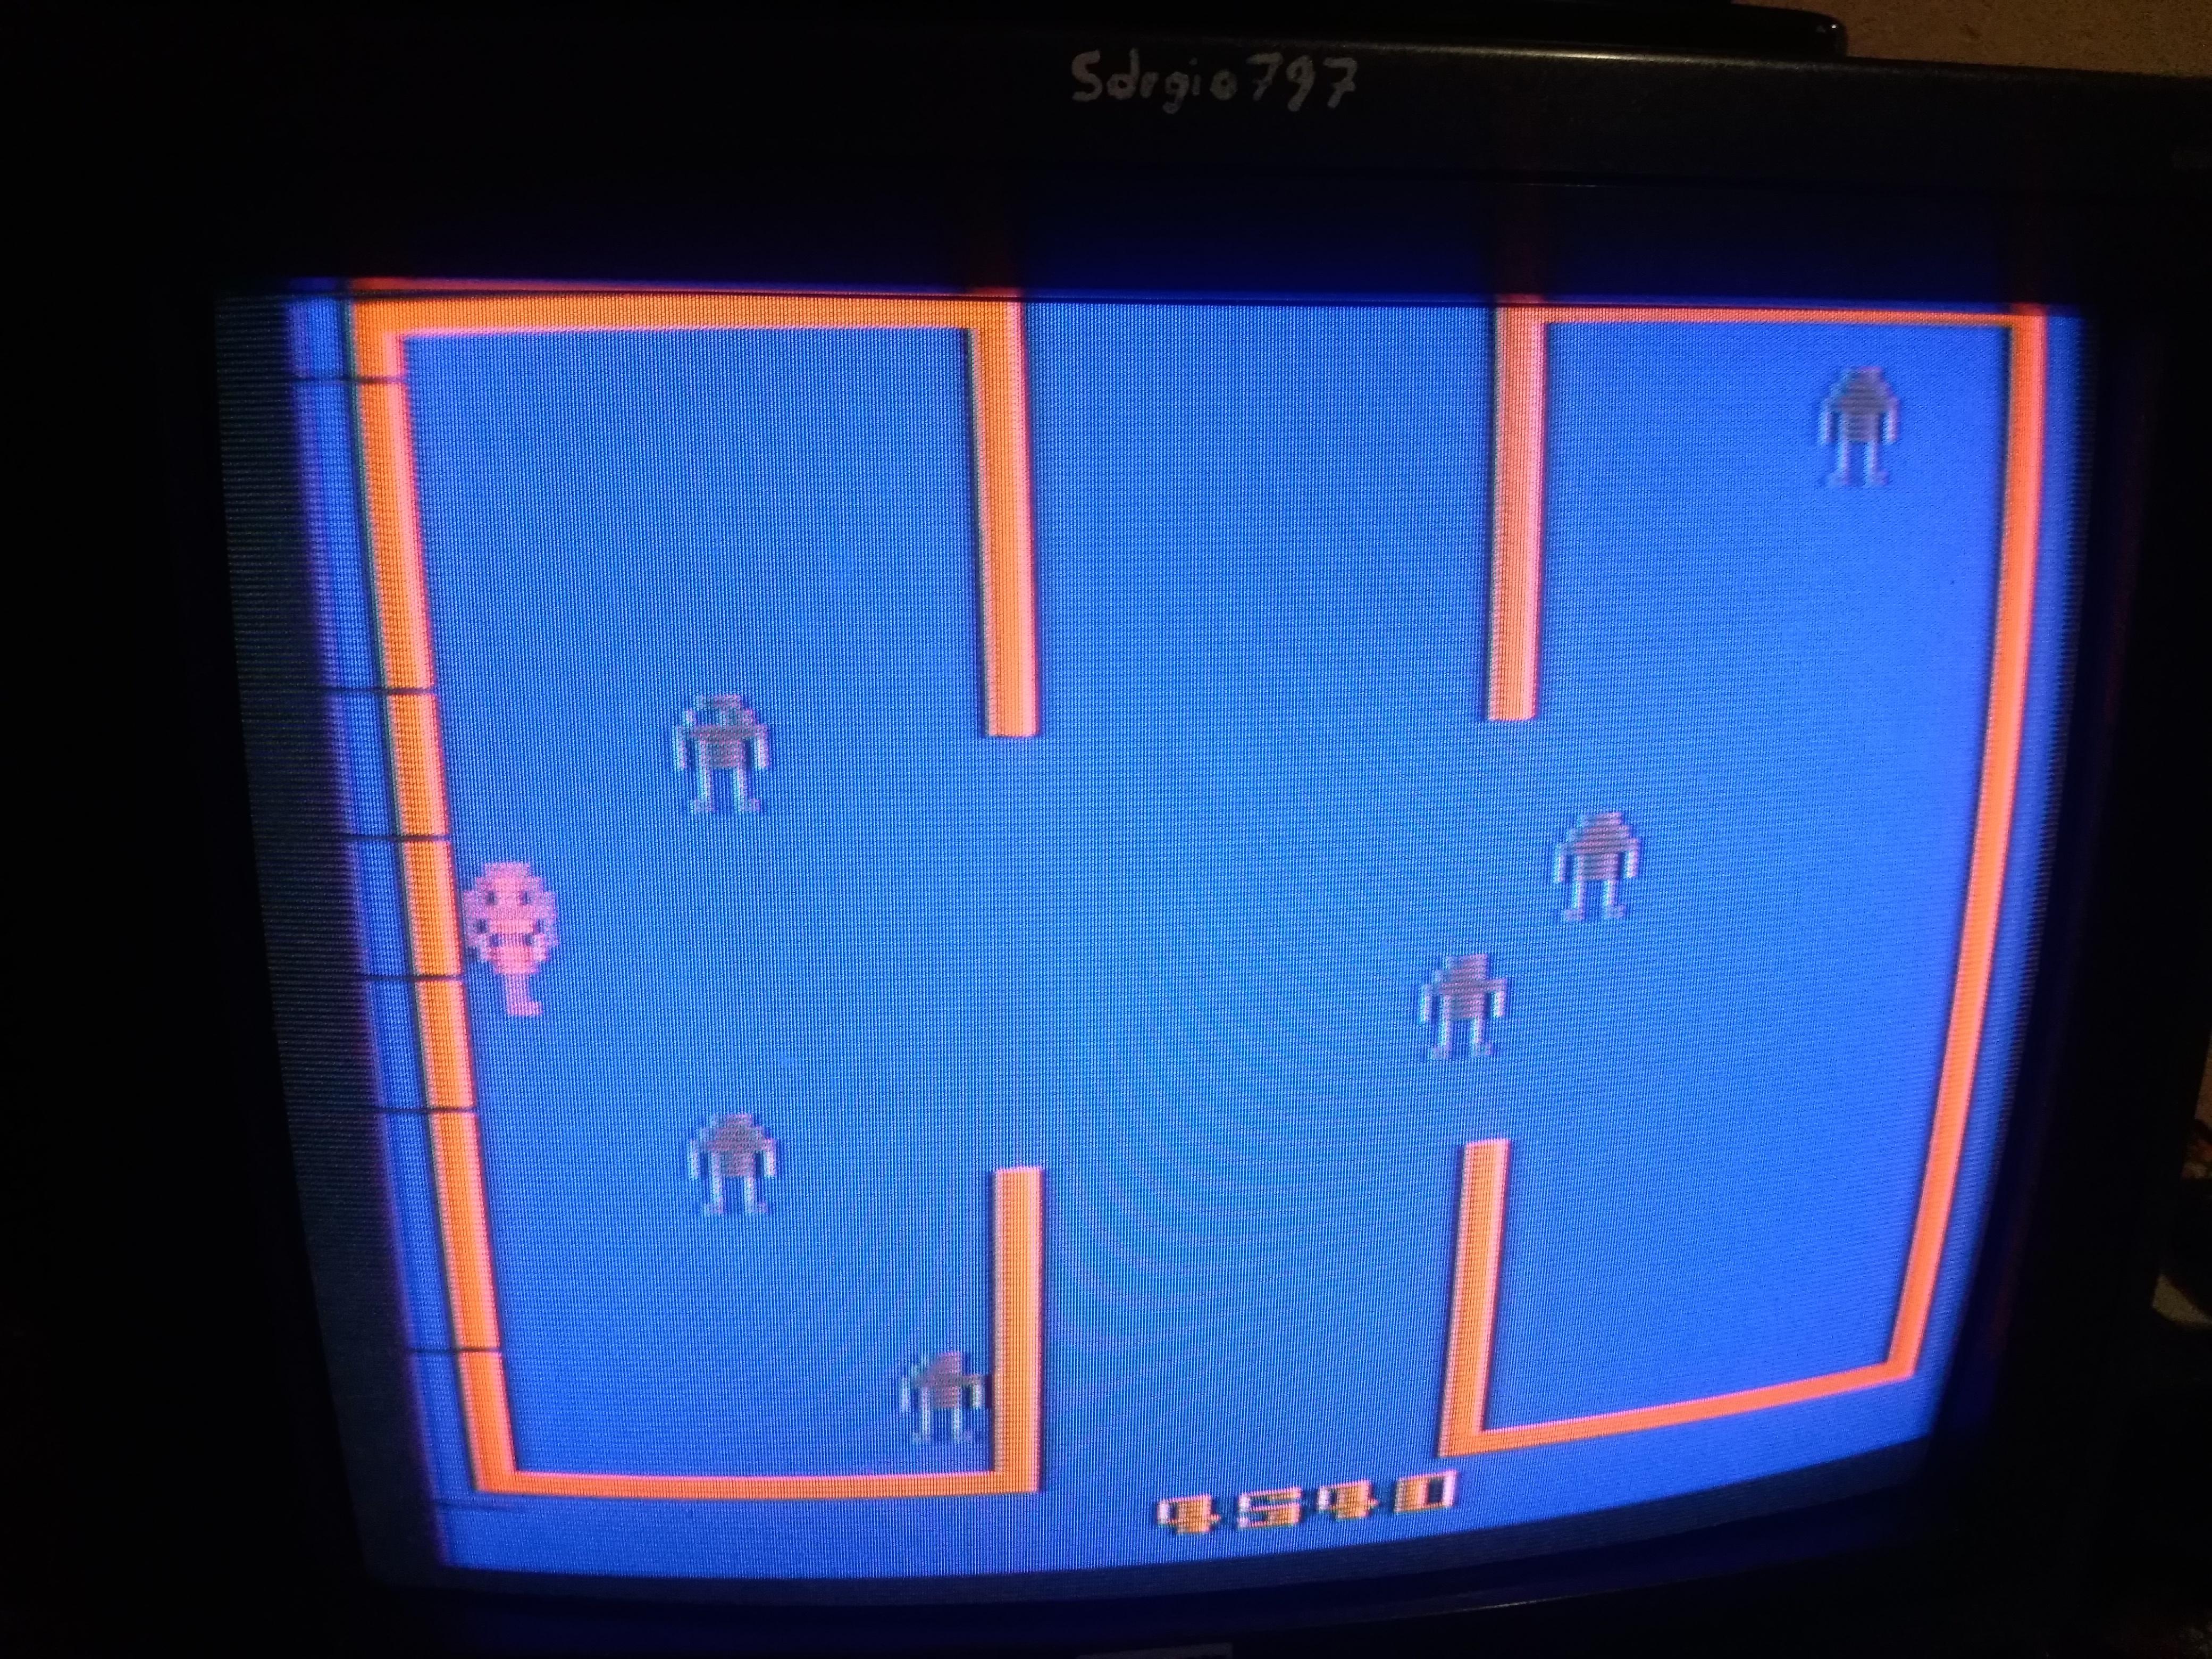 Sdrgio797: Berzerk: Game 9 (Atari 2600) 4,540 points on 2020-06-28 03:32:06